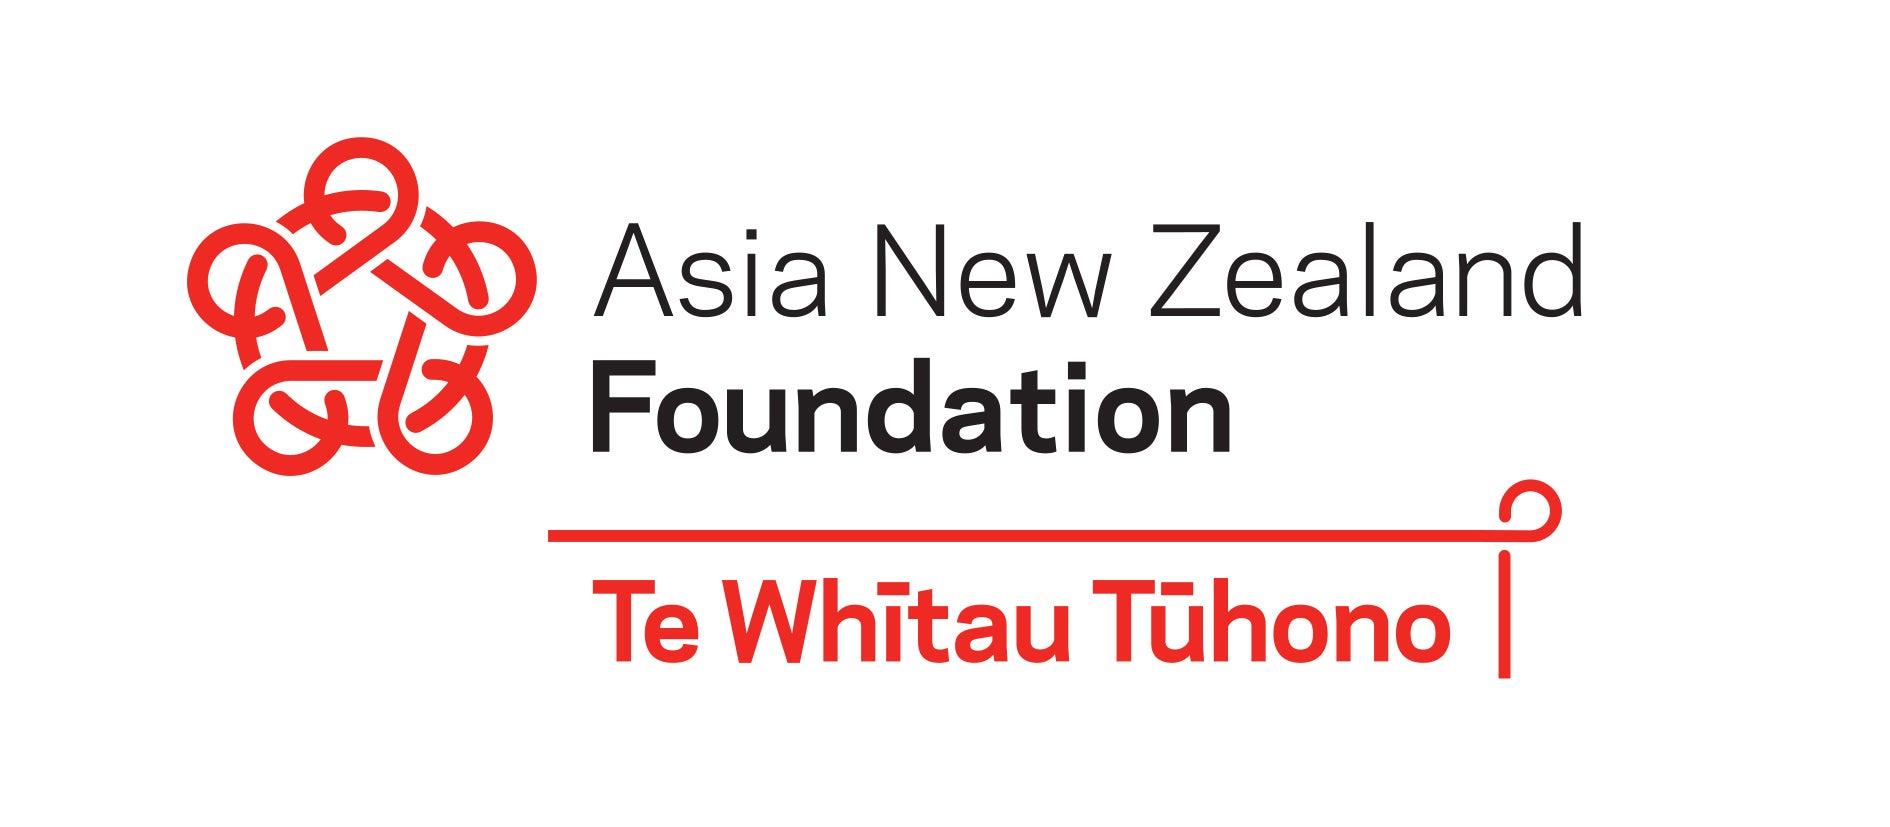 Asia New Zealand